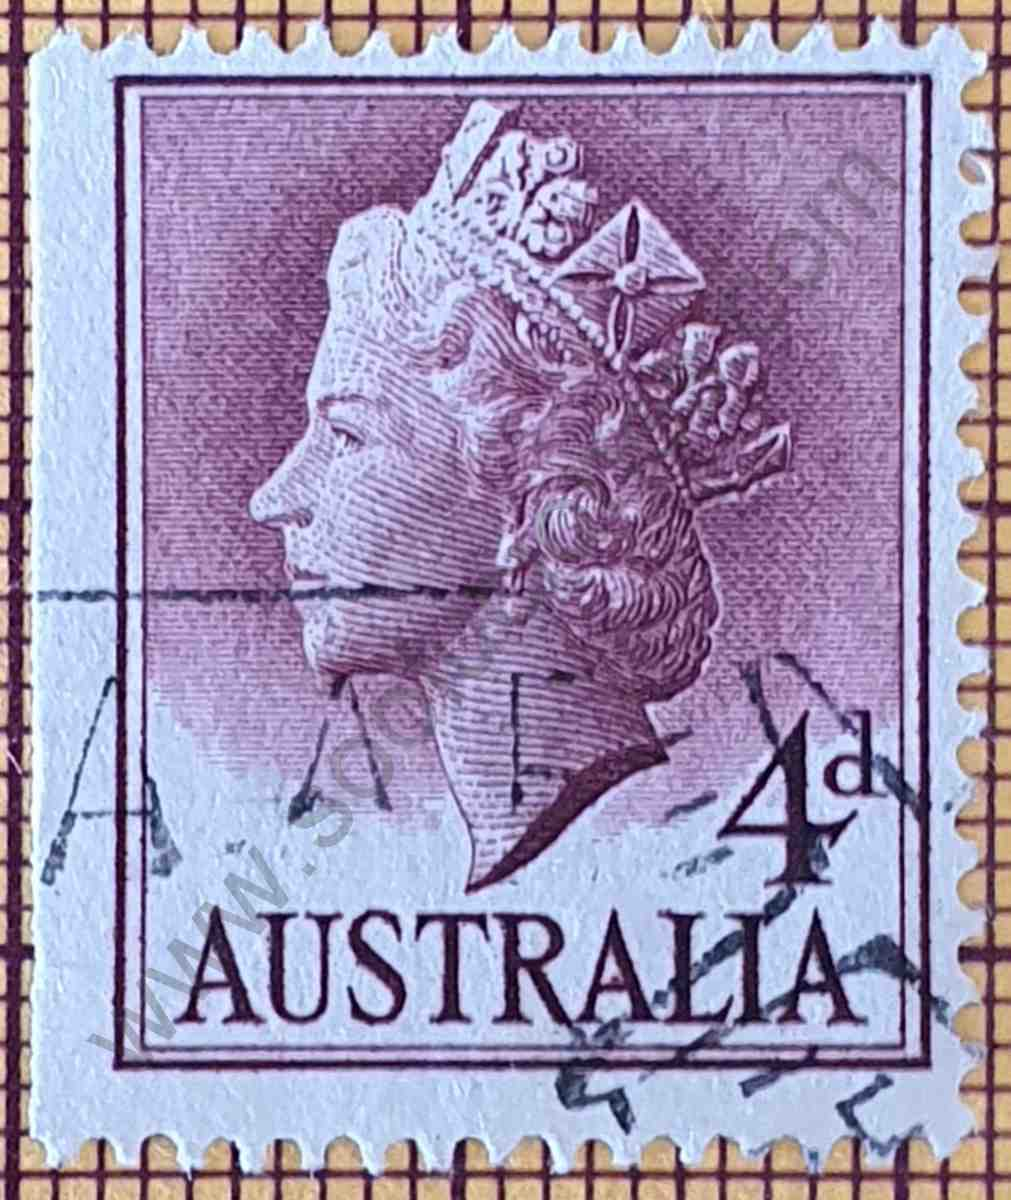 Estampilla Isabel II 4d - Australia 1957